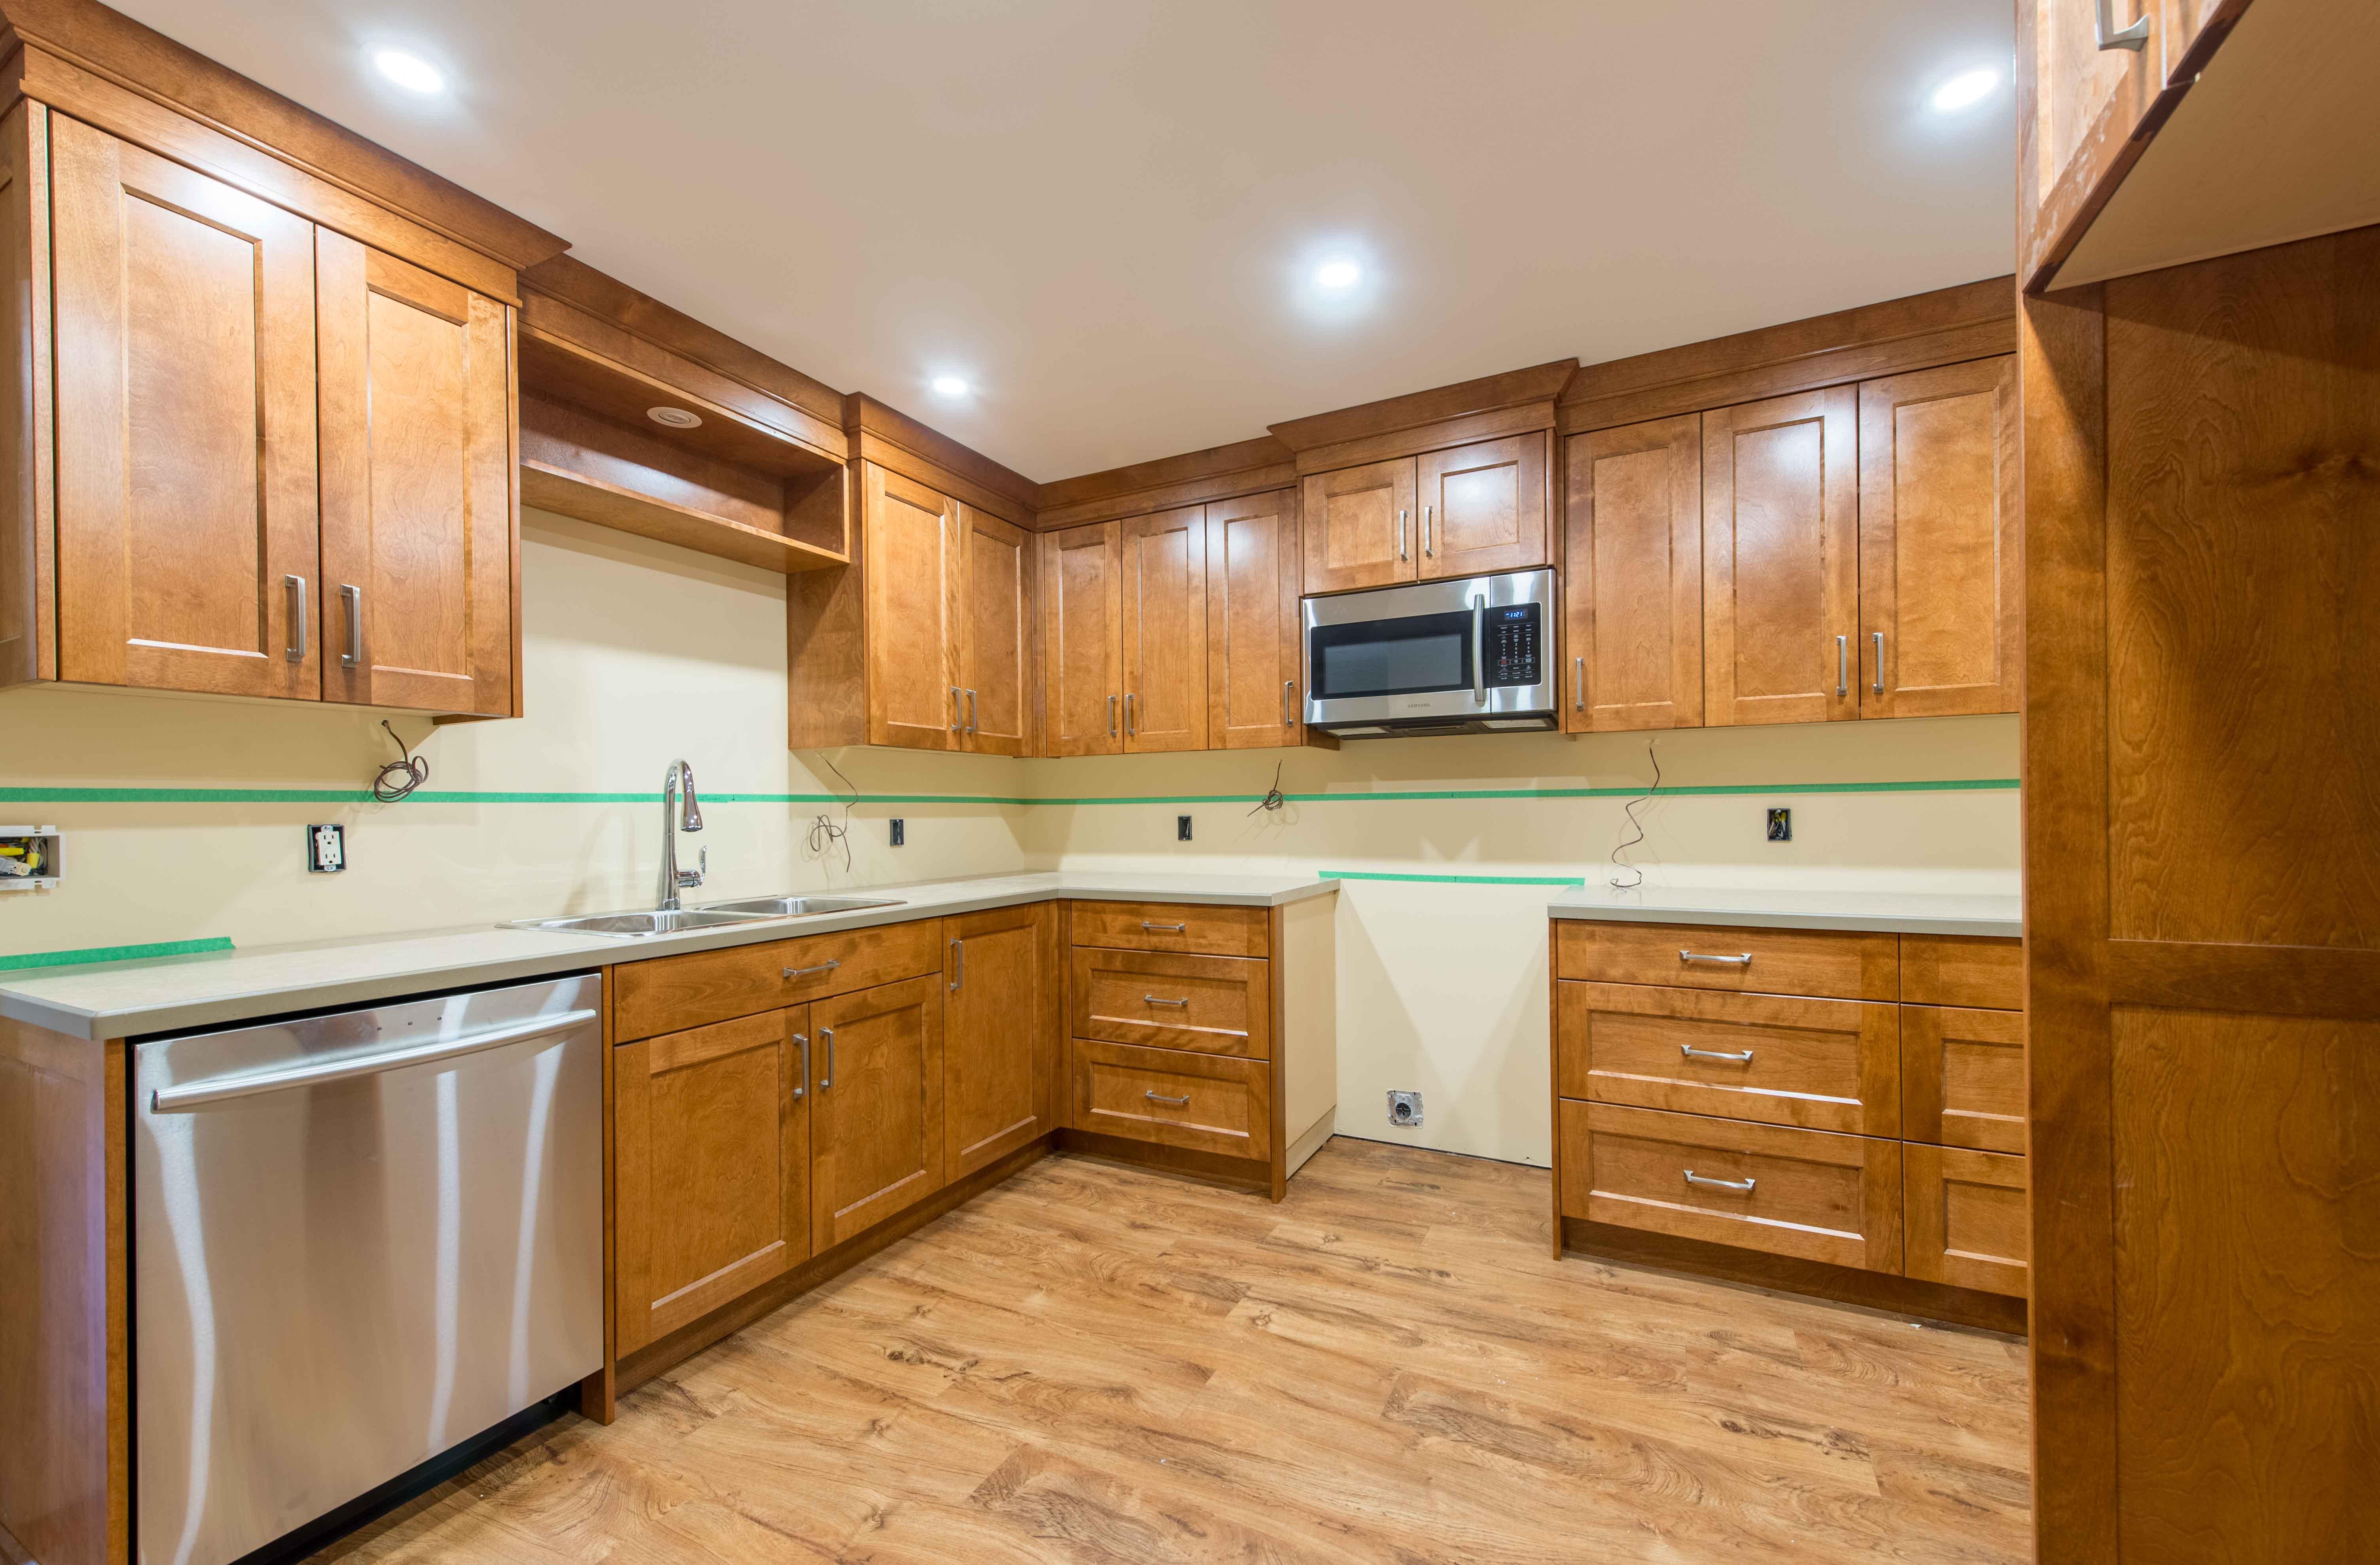 Custom built wood kitchen cabinets